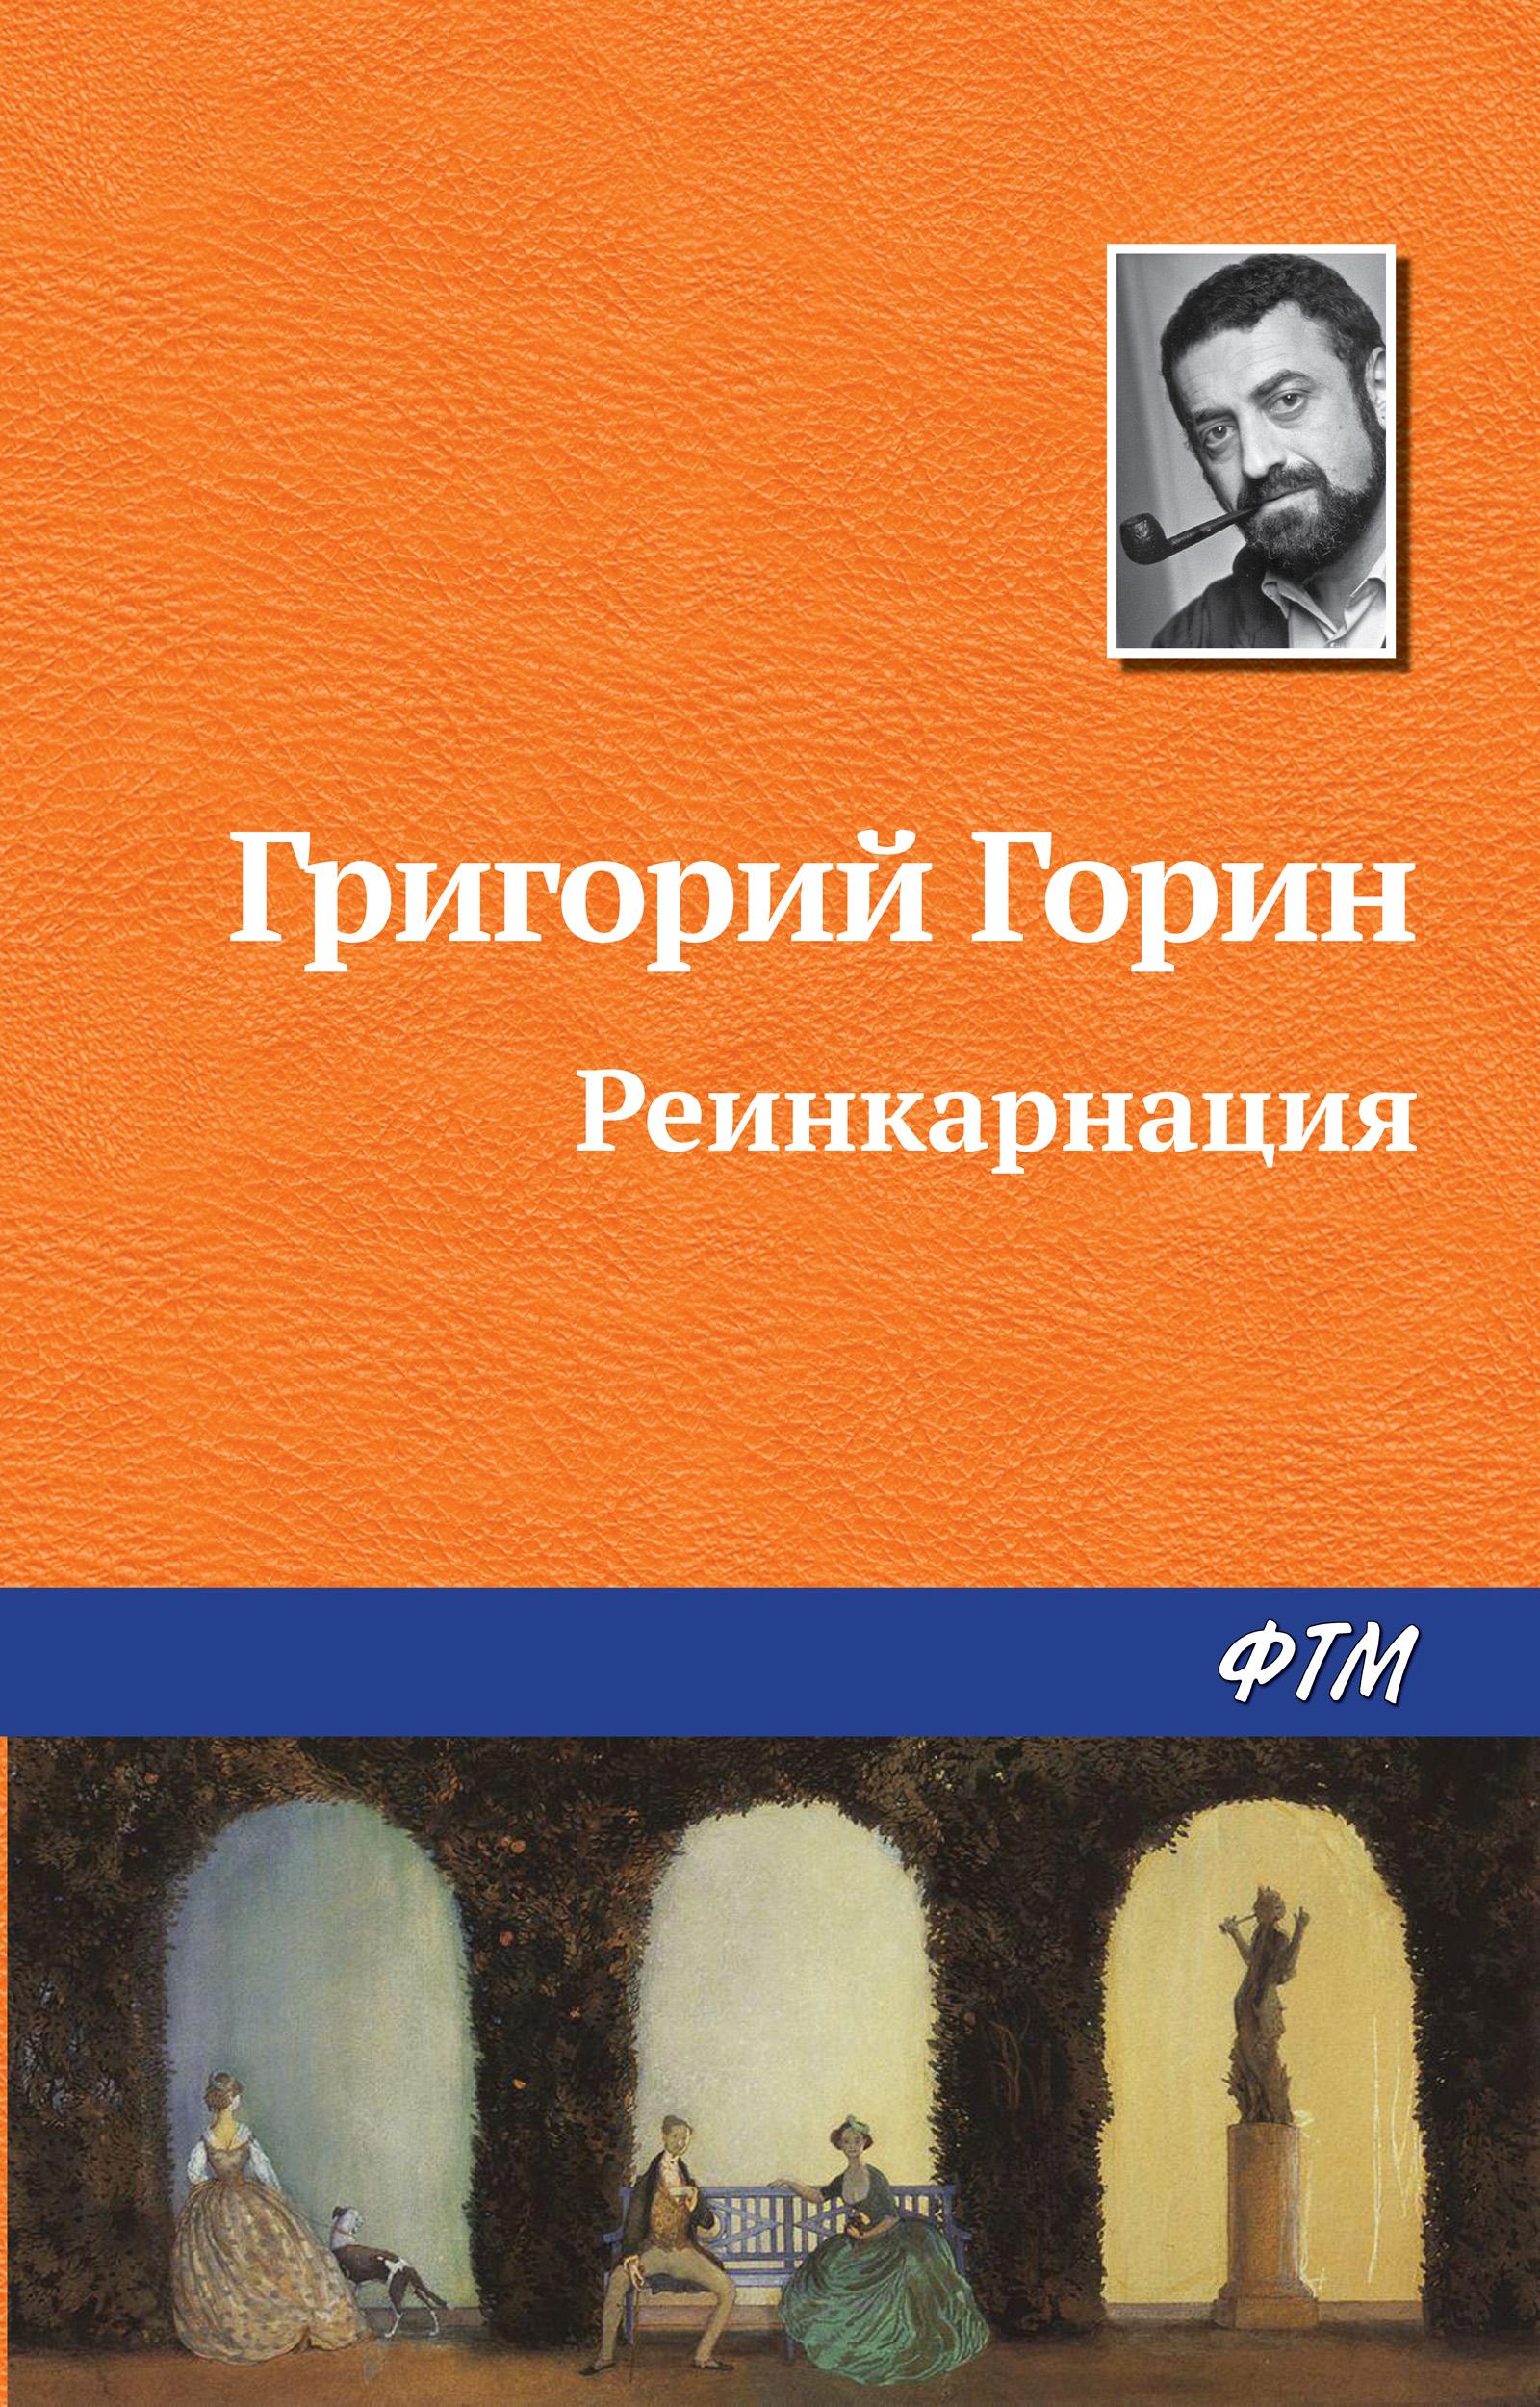 Реинкарнация ( Григорий Горин  )